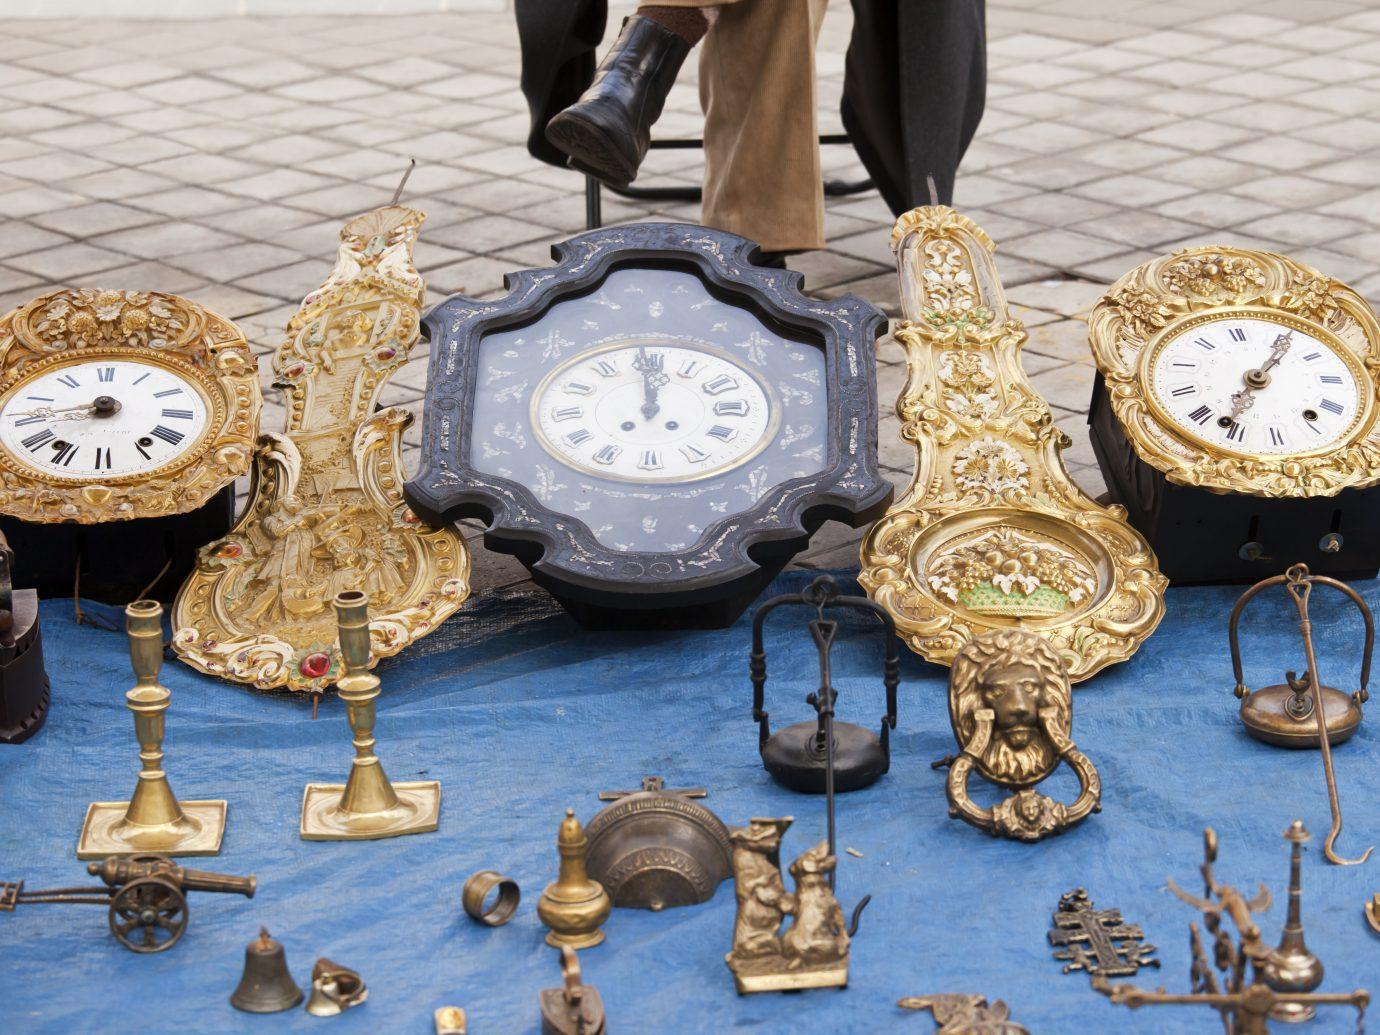 Antique clocks at El Rastro market